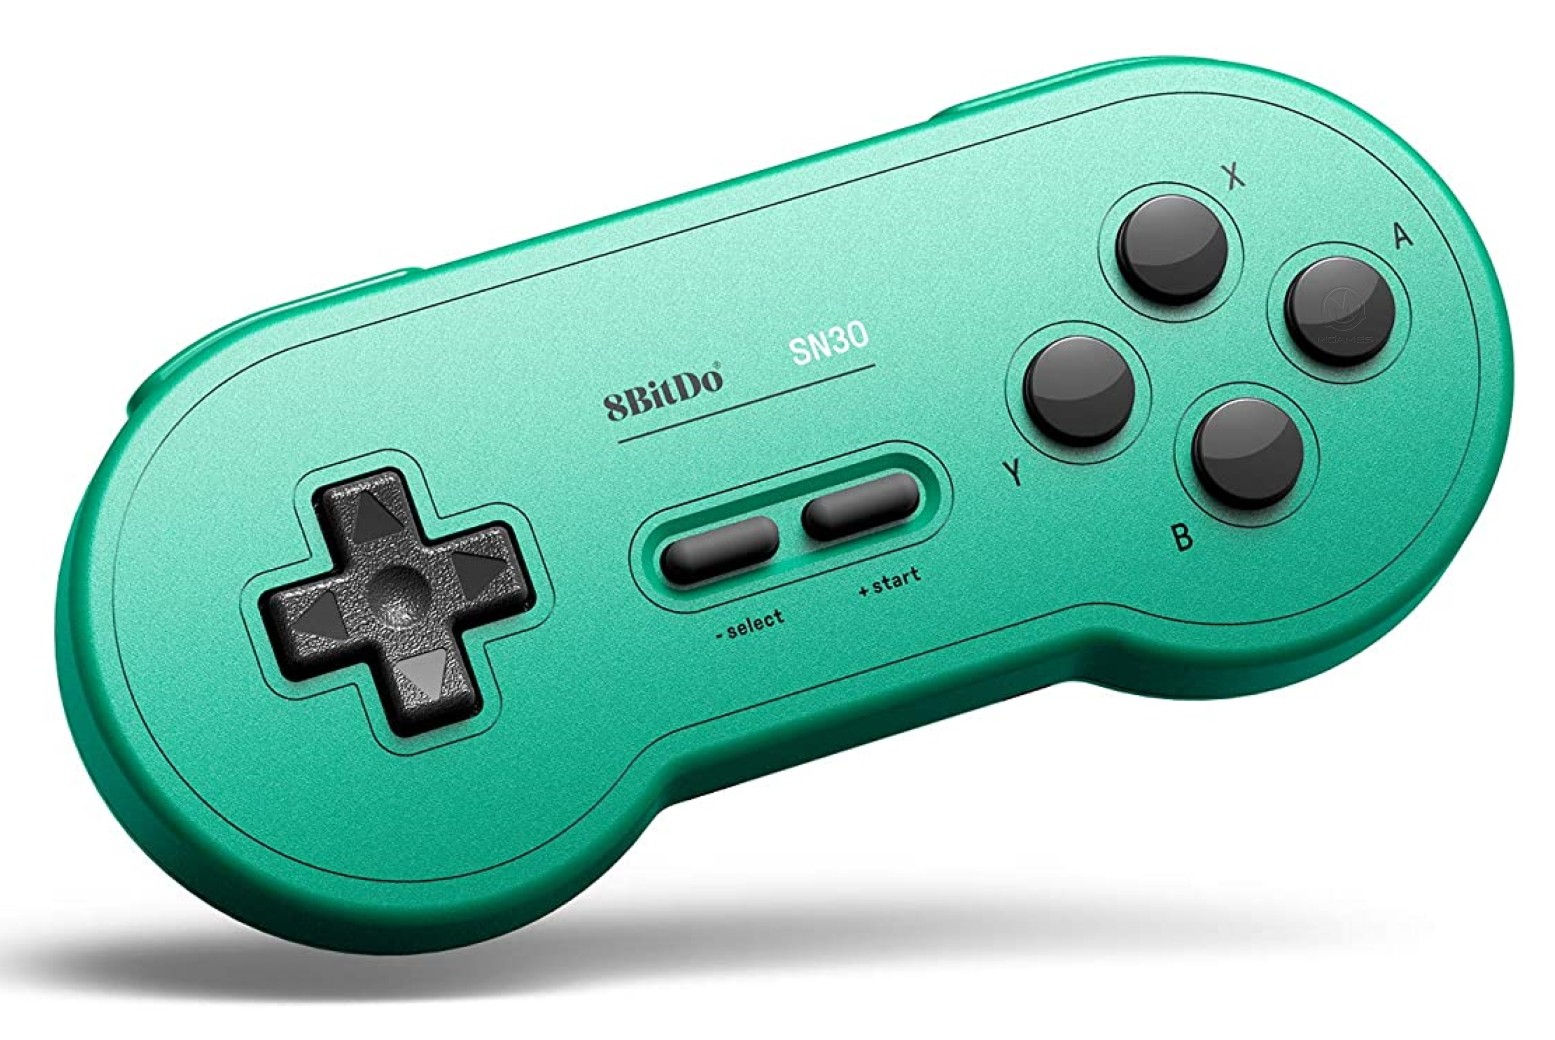 8BitDo SN30 Wireless Bluetooth Gamepad GP Green | 8BitDo SN30 бездротовий Bluetooth контролер/джойстик/геймпад